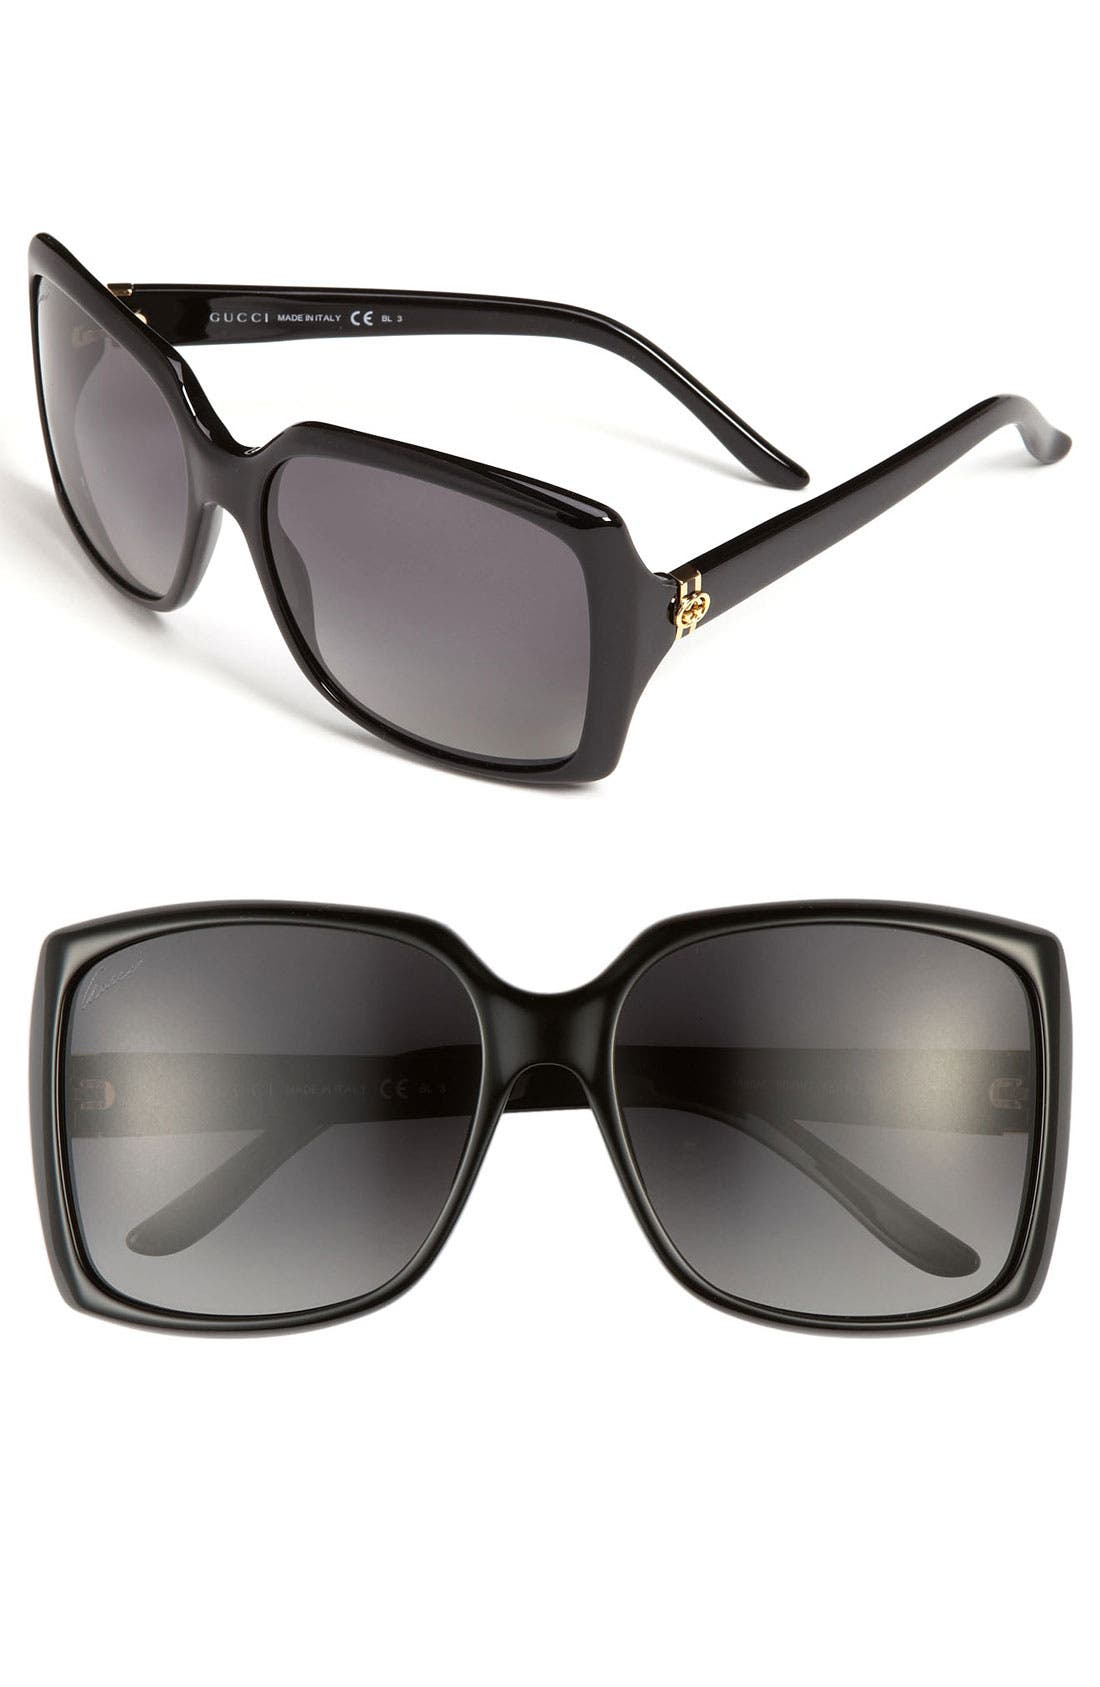 Main Image - Gucci 58mm Polarized Sunglasses